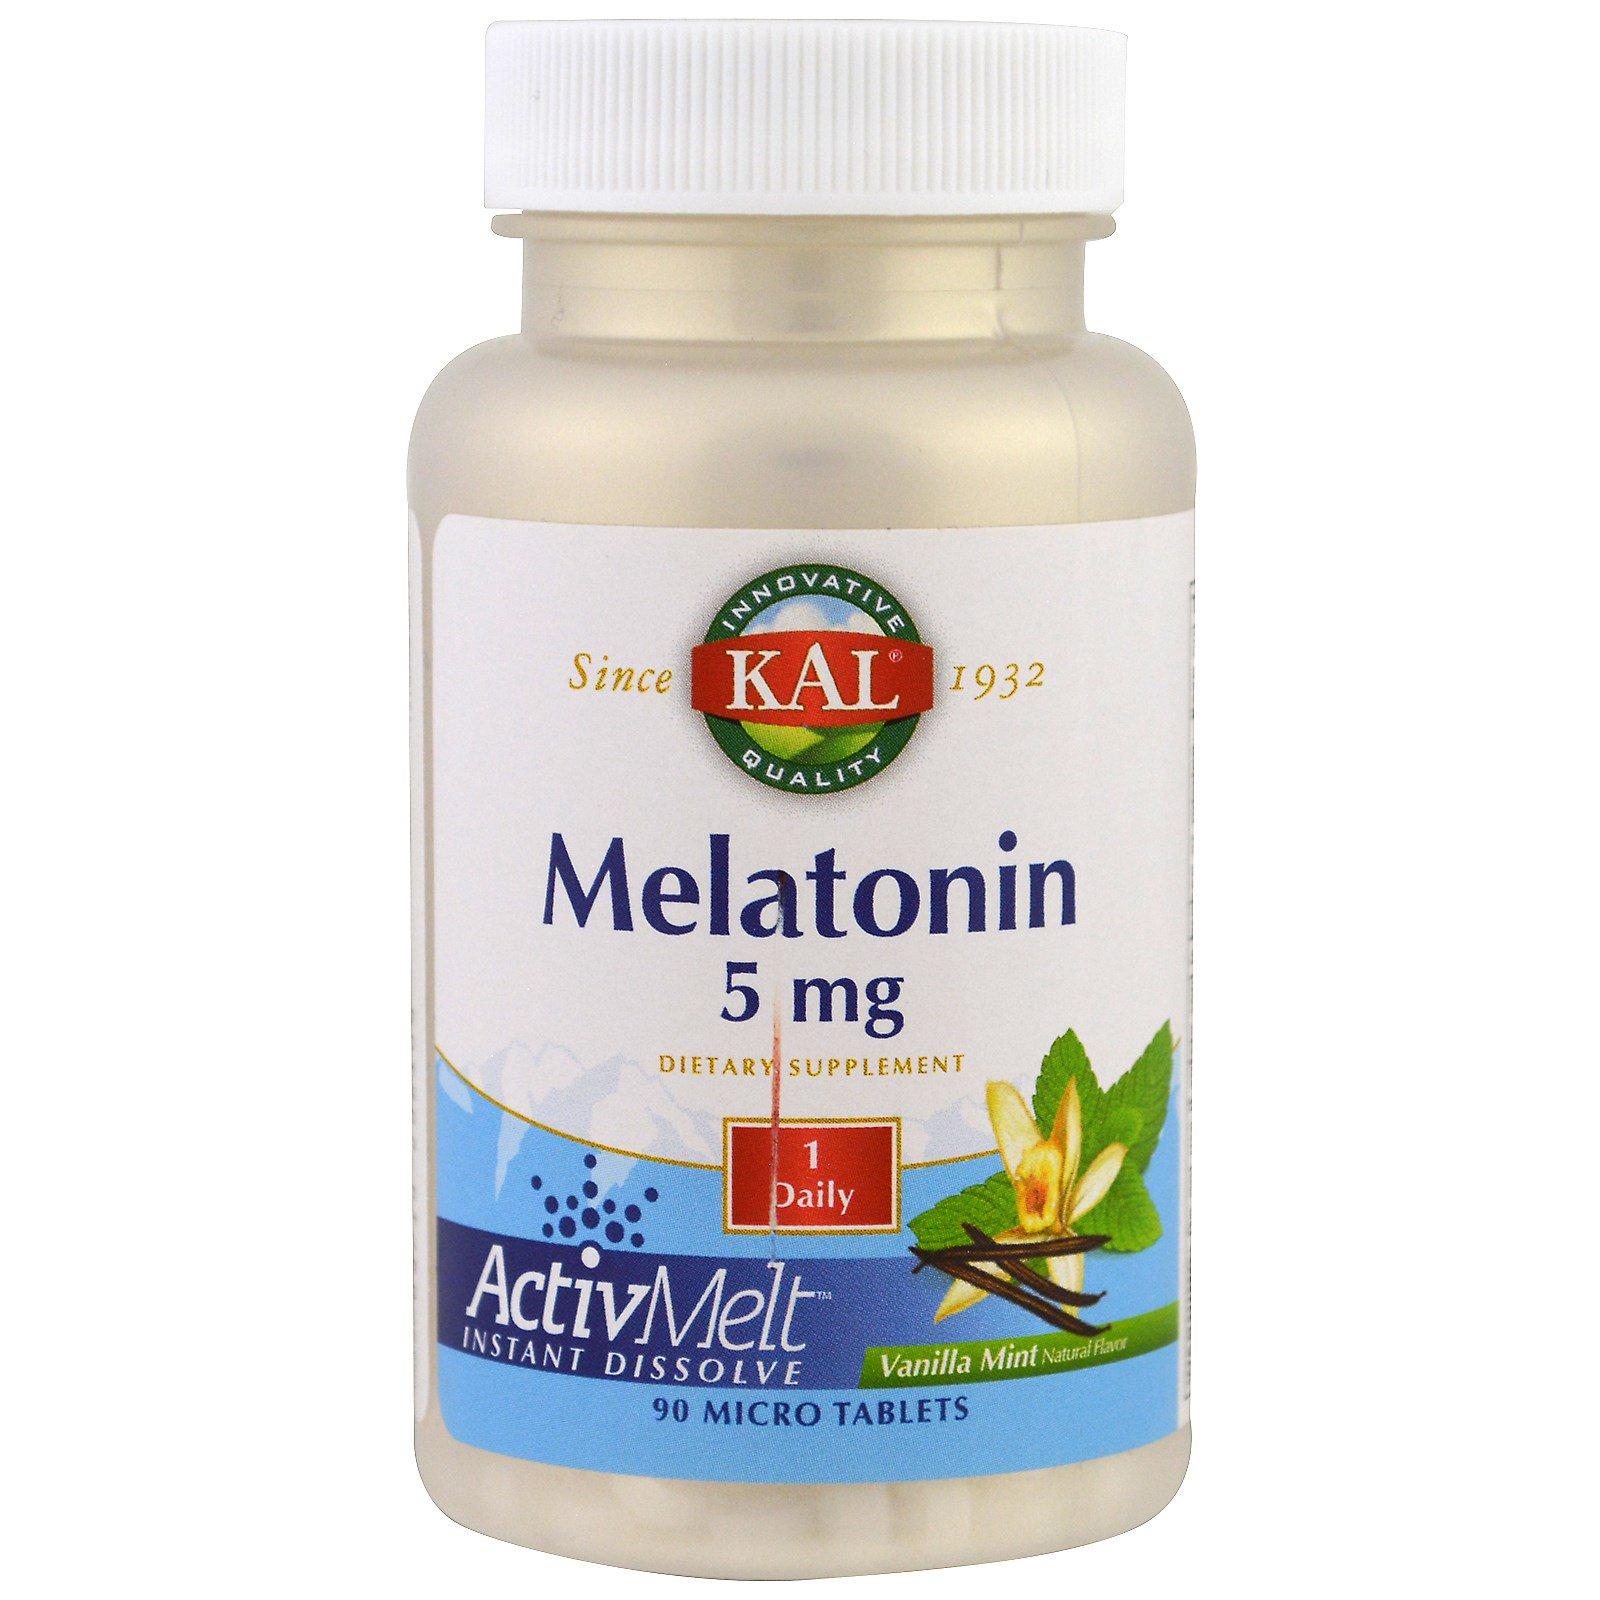 Kal Melatonin 3 Mg 120 Tablets: KAL, Melatonin, Vanilla Mint, 5 Mg, 90 Micro Tablets